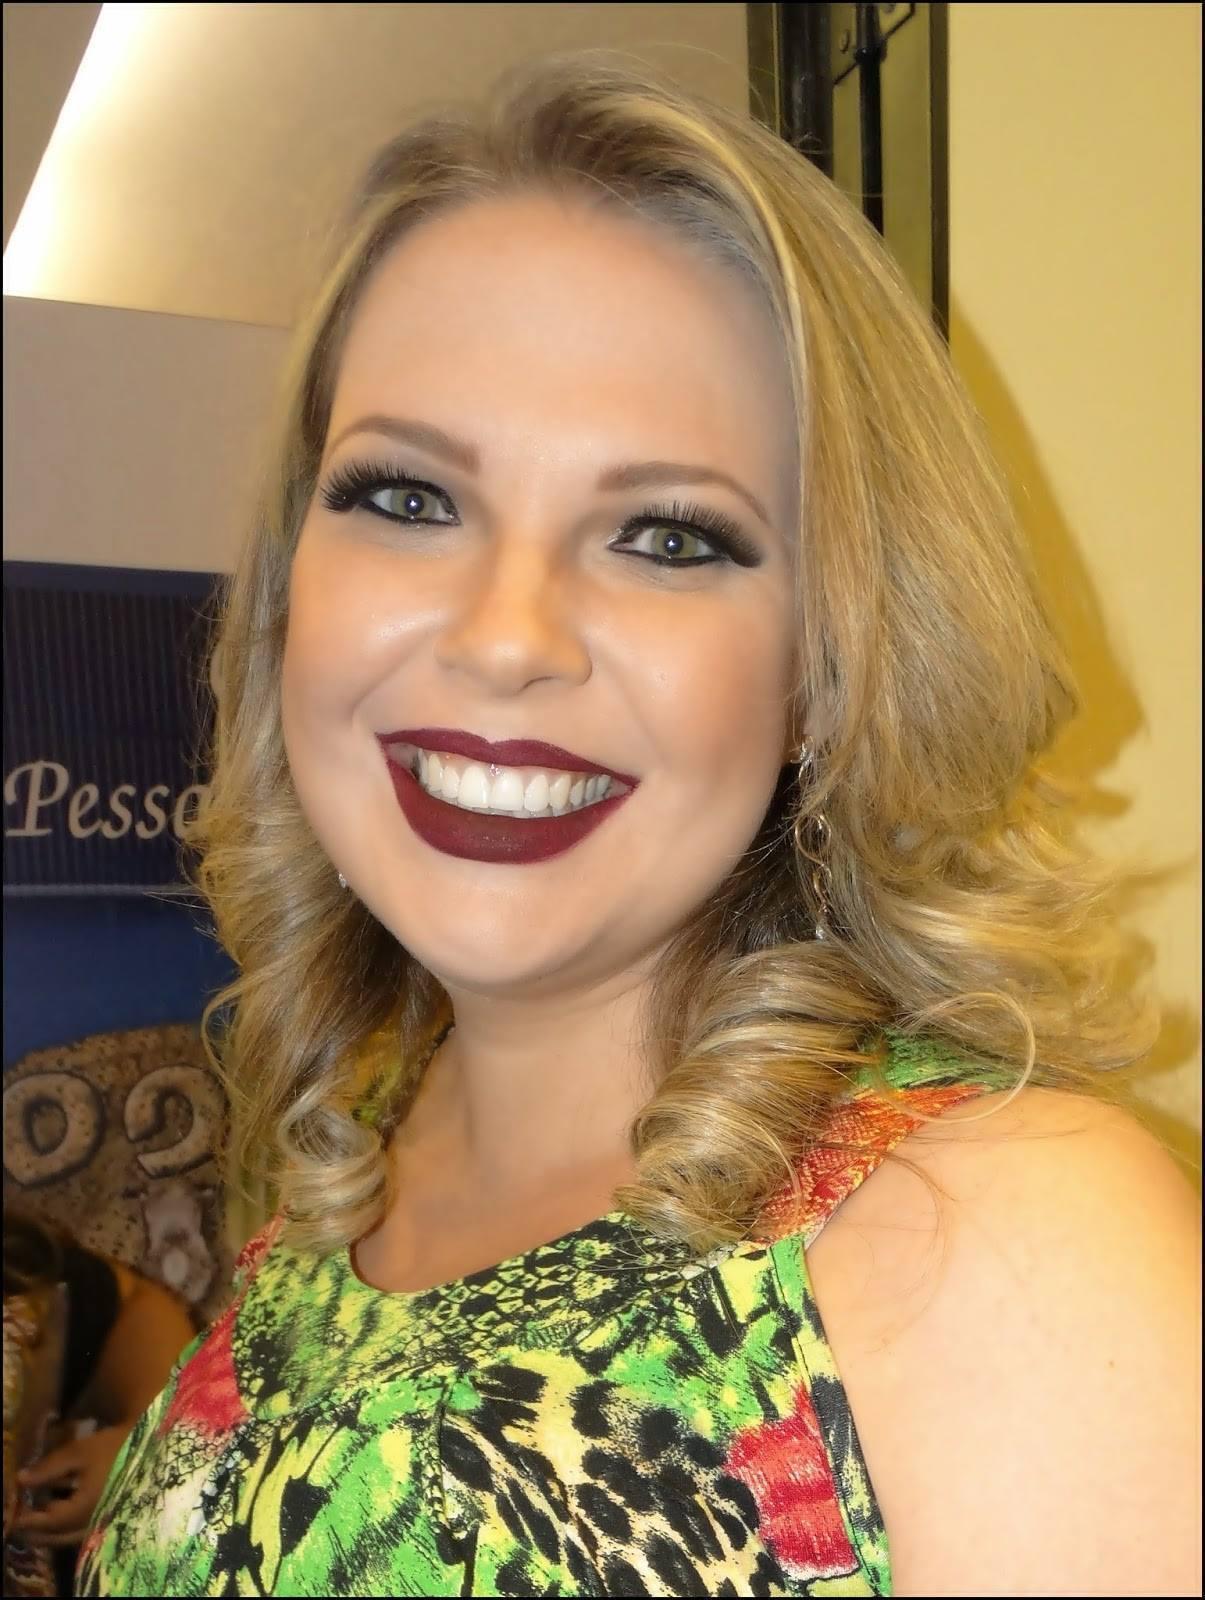 Danielle Ramalho Desfile Ateliê @plussize 2015 Makeup: Mônica Silva Foto: Divulgação #MônicaSilvaMakeup #MissPlusSize #MaquiadoradasMisses #Maquiagem #Desfile maquiagem maquiador(a) consultor(a)